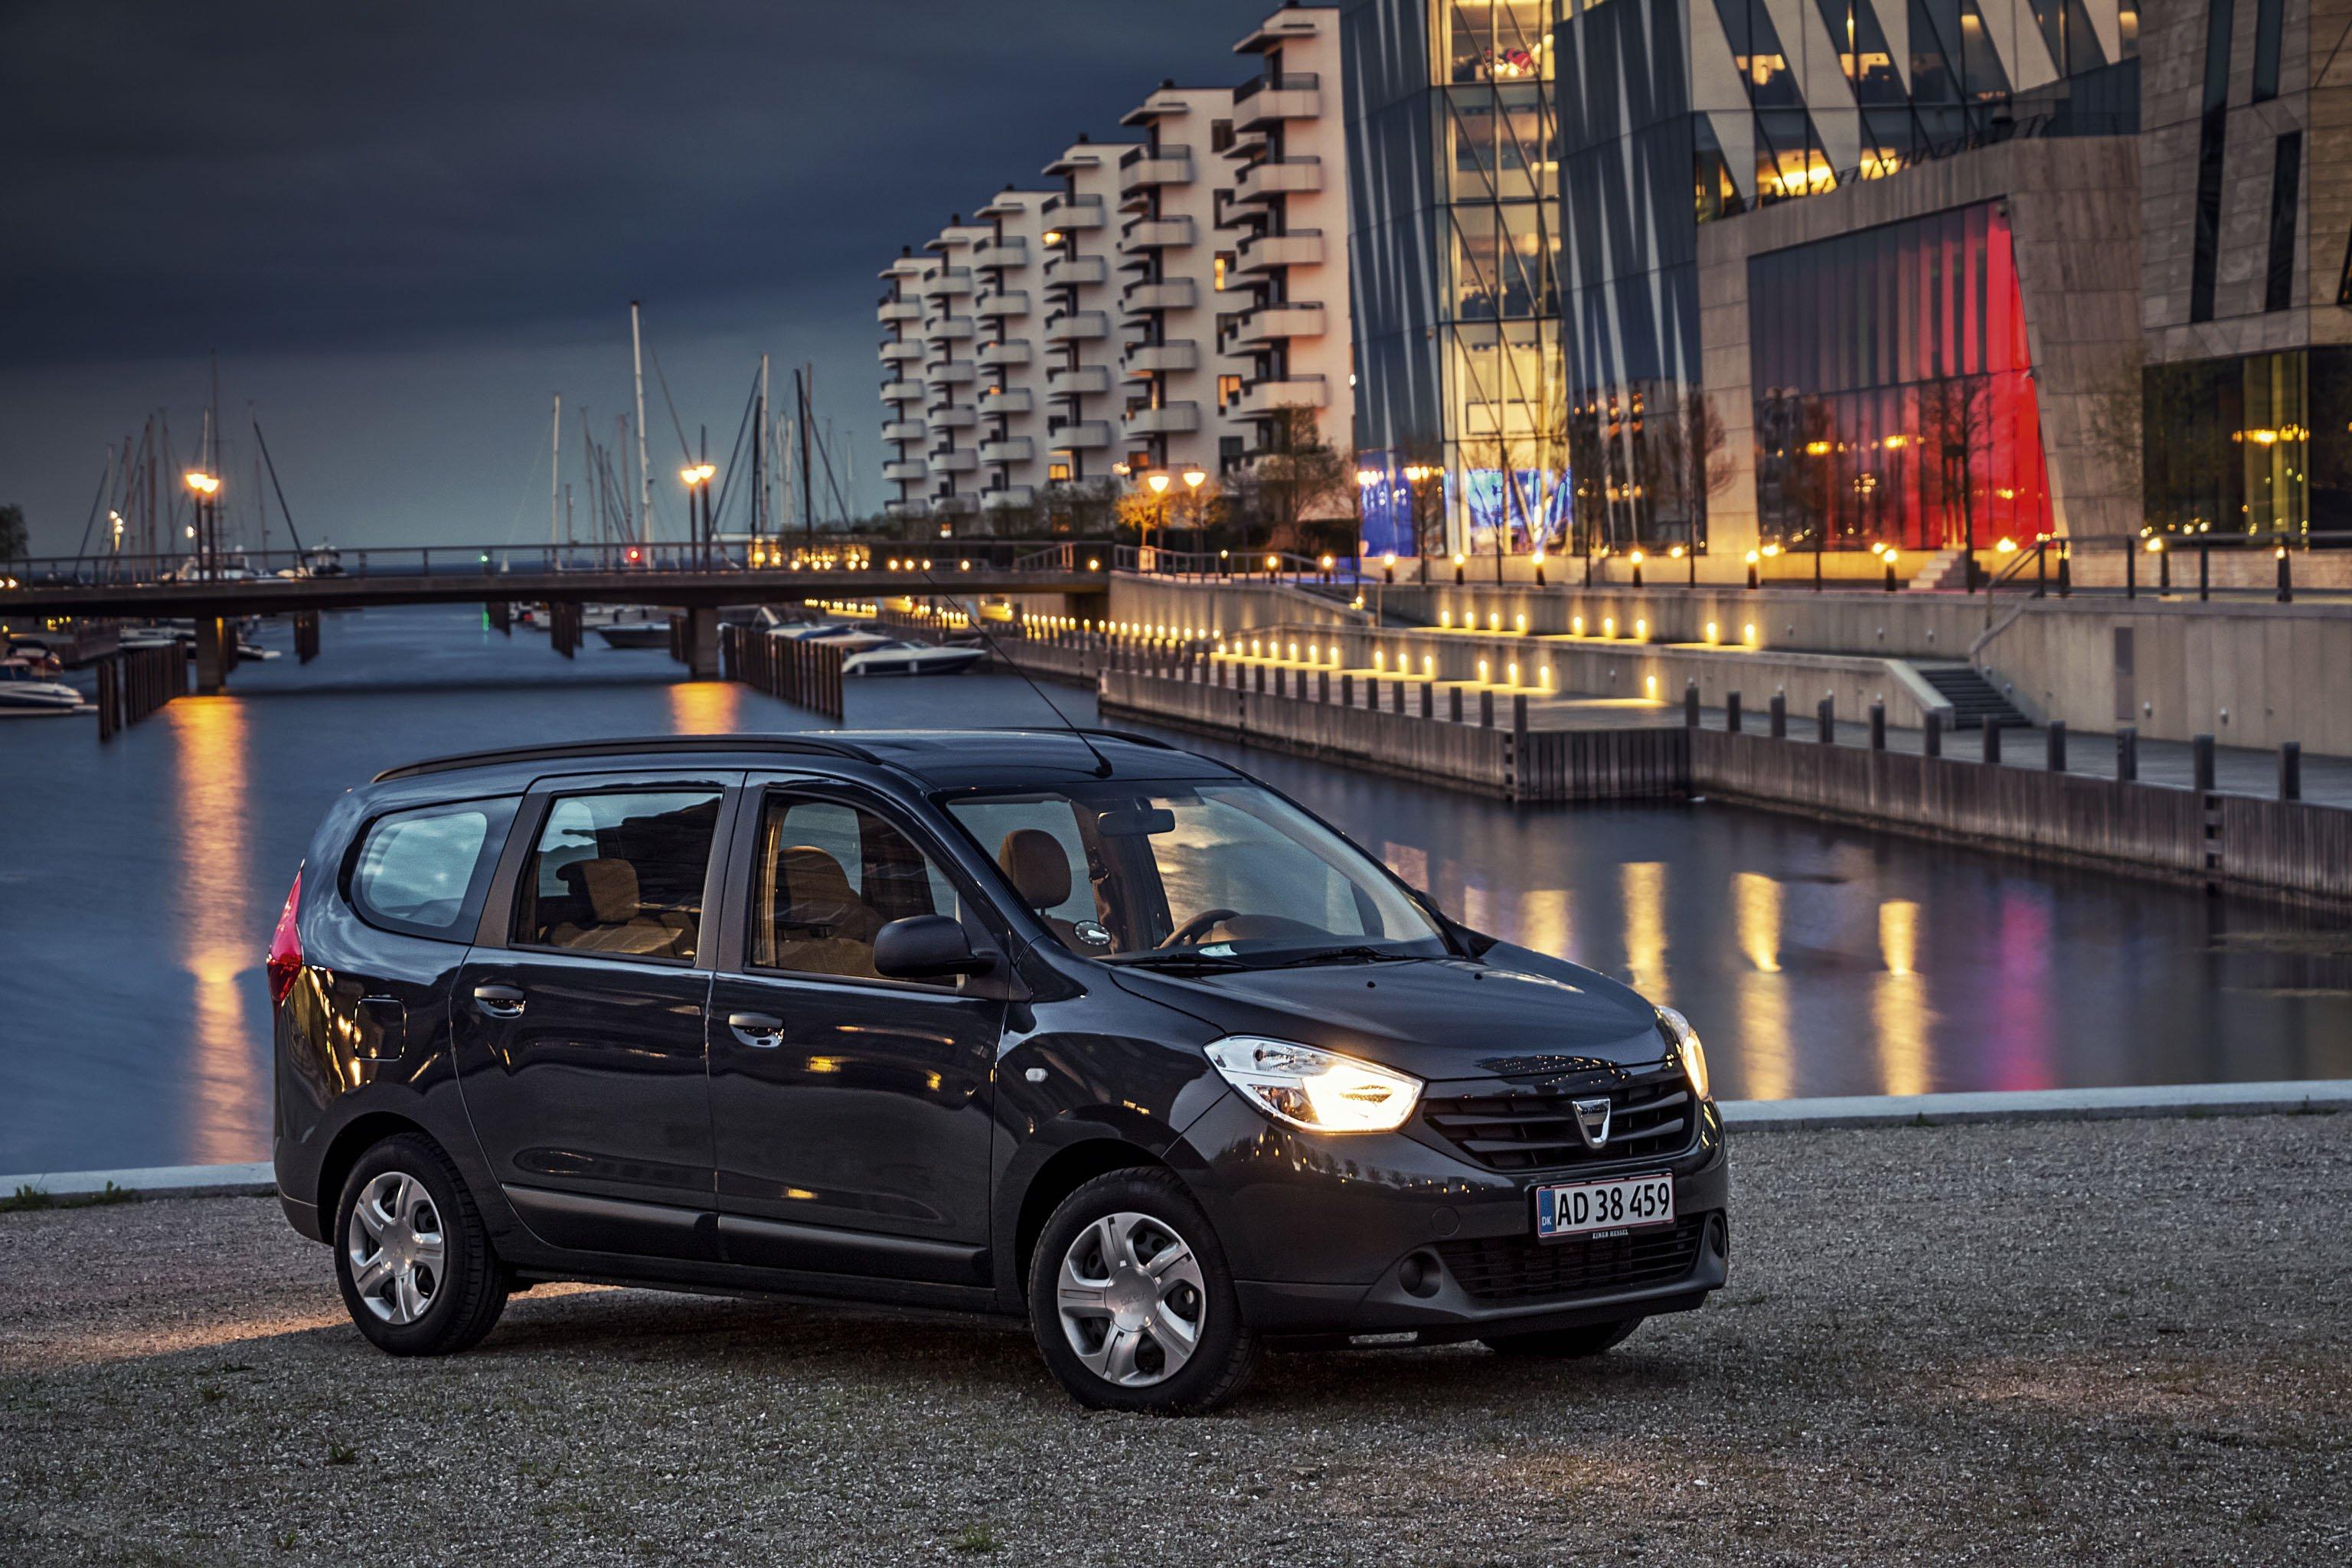 Dacia Lodgy 1,6 Ambiance 7p | Bilmagasinet.dk